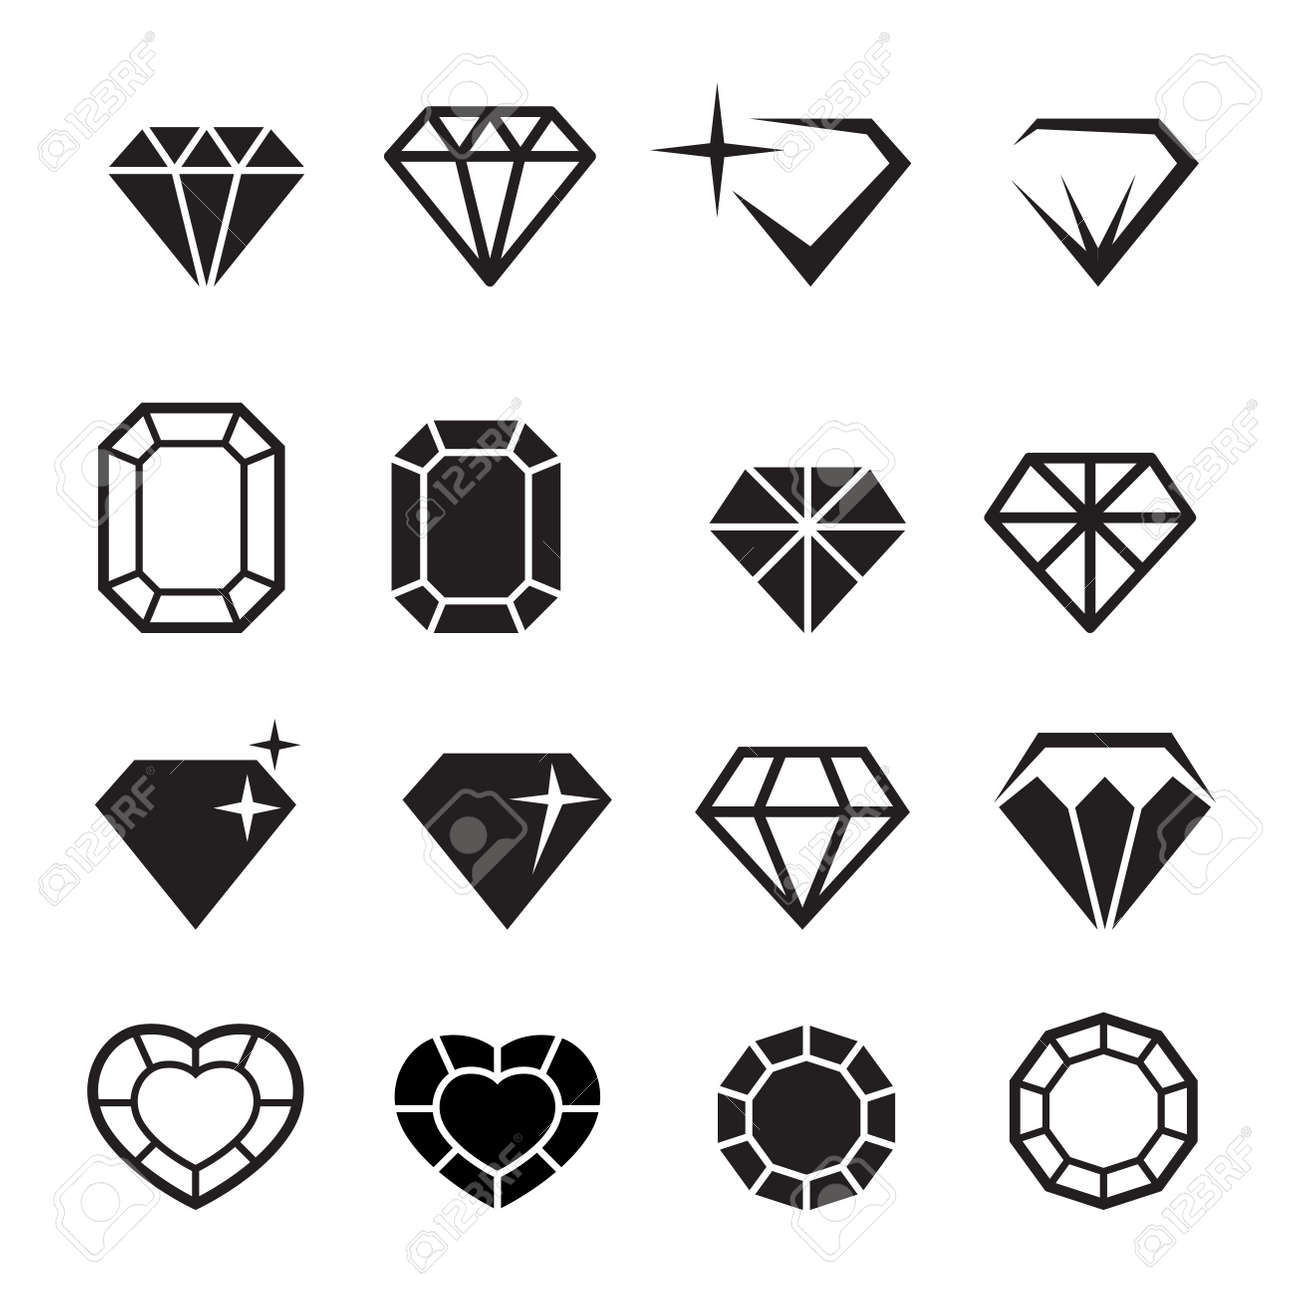 Diamond icons set vector - 52045144